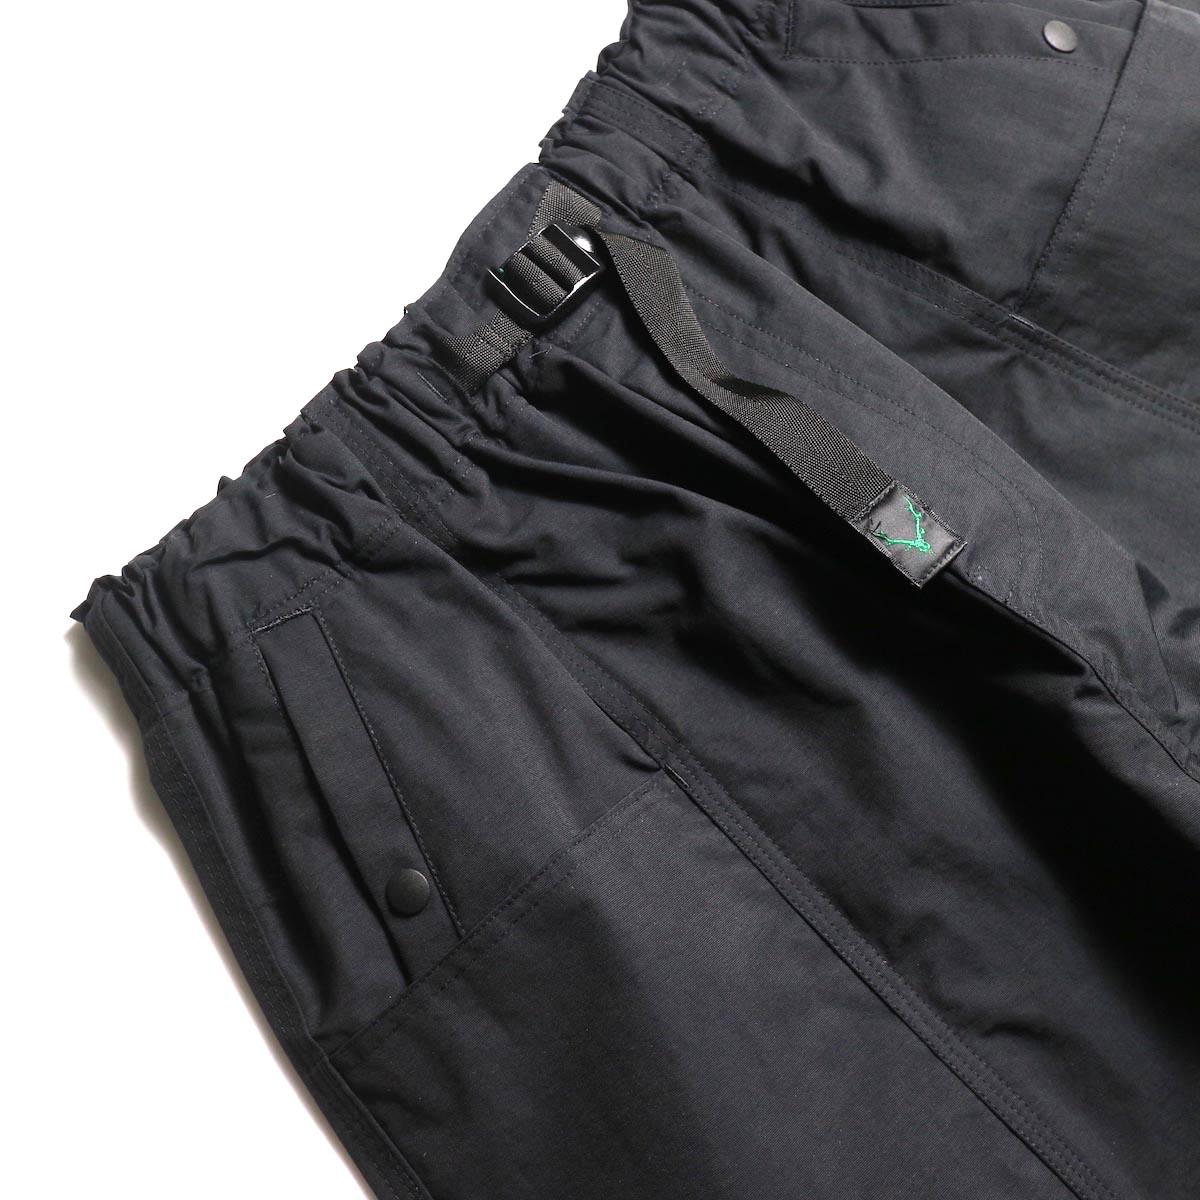 SOUTH2 WEST8 / Belted Center Seam Short -Nylon Tussore (Black) ベルト